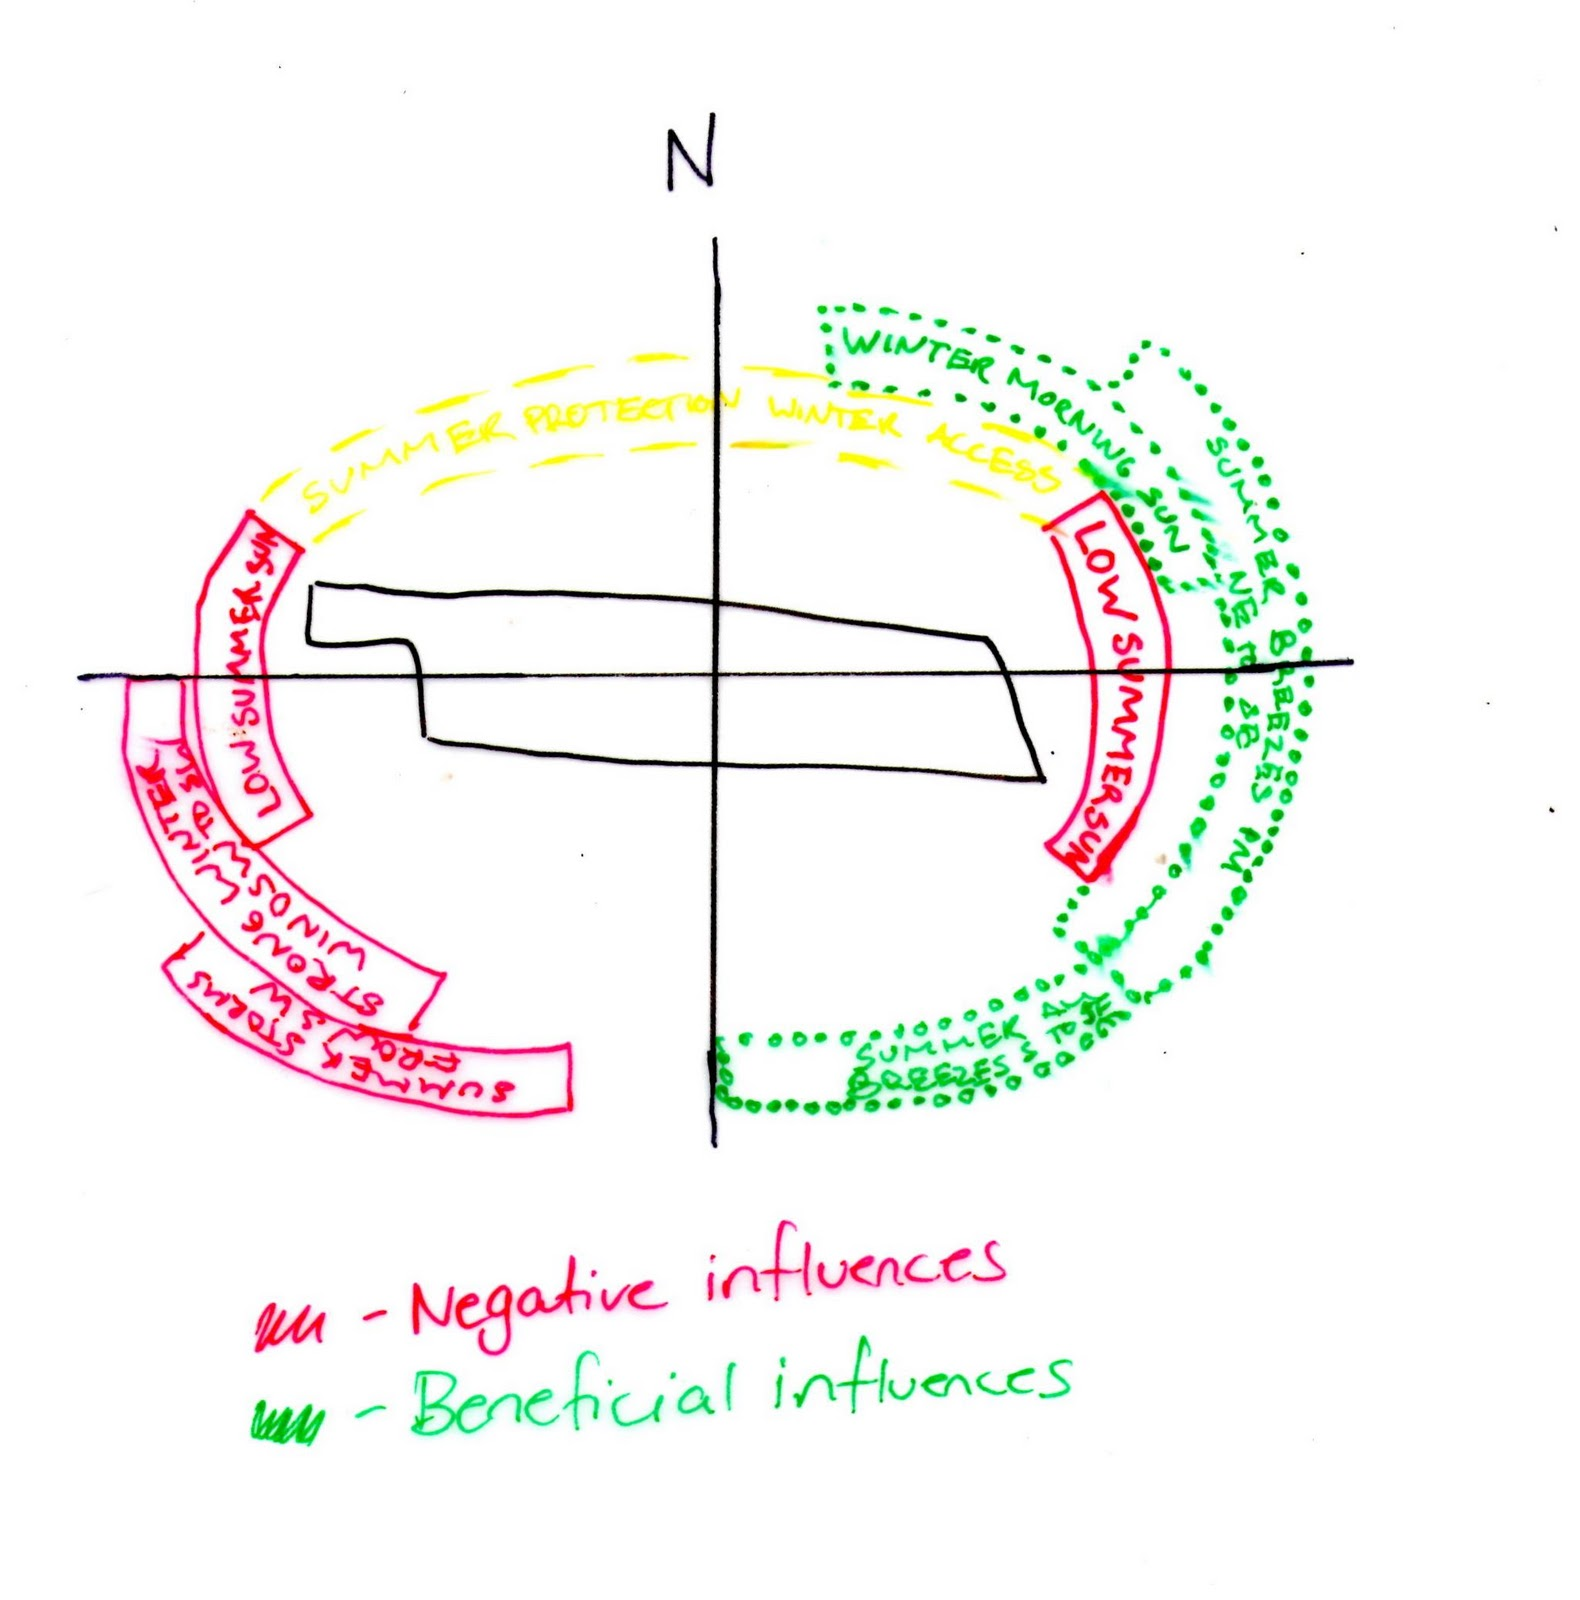 winter in space diagram ezgo wiring gas golf cart architectural apprenticeship project 1 part c